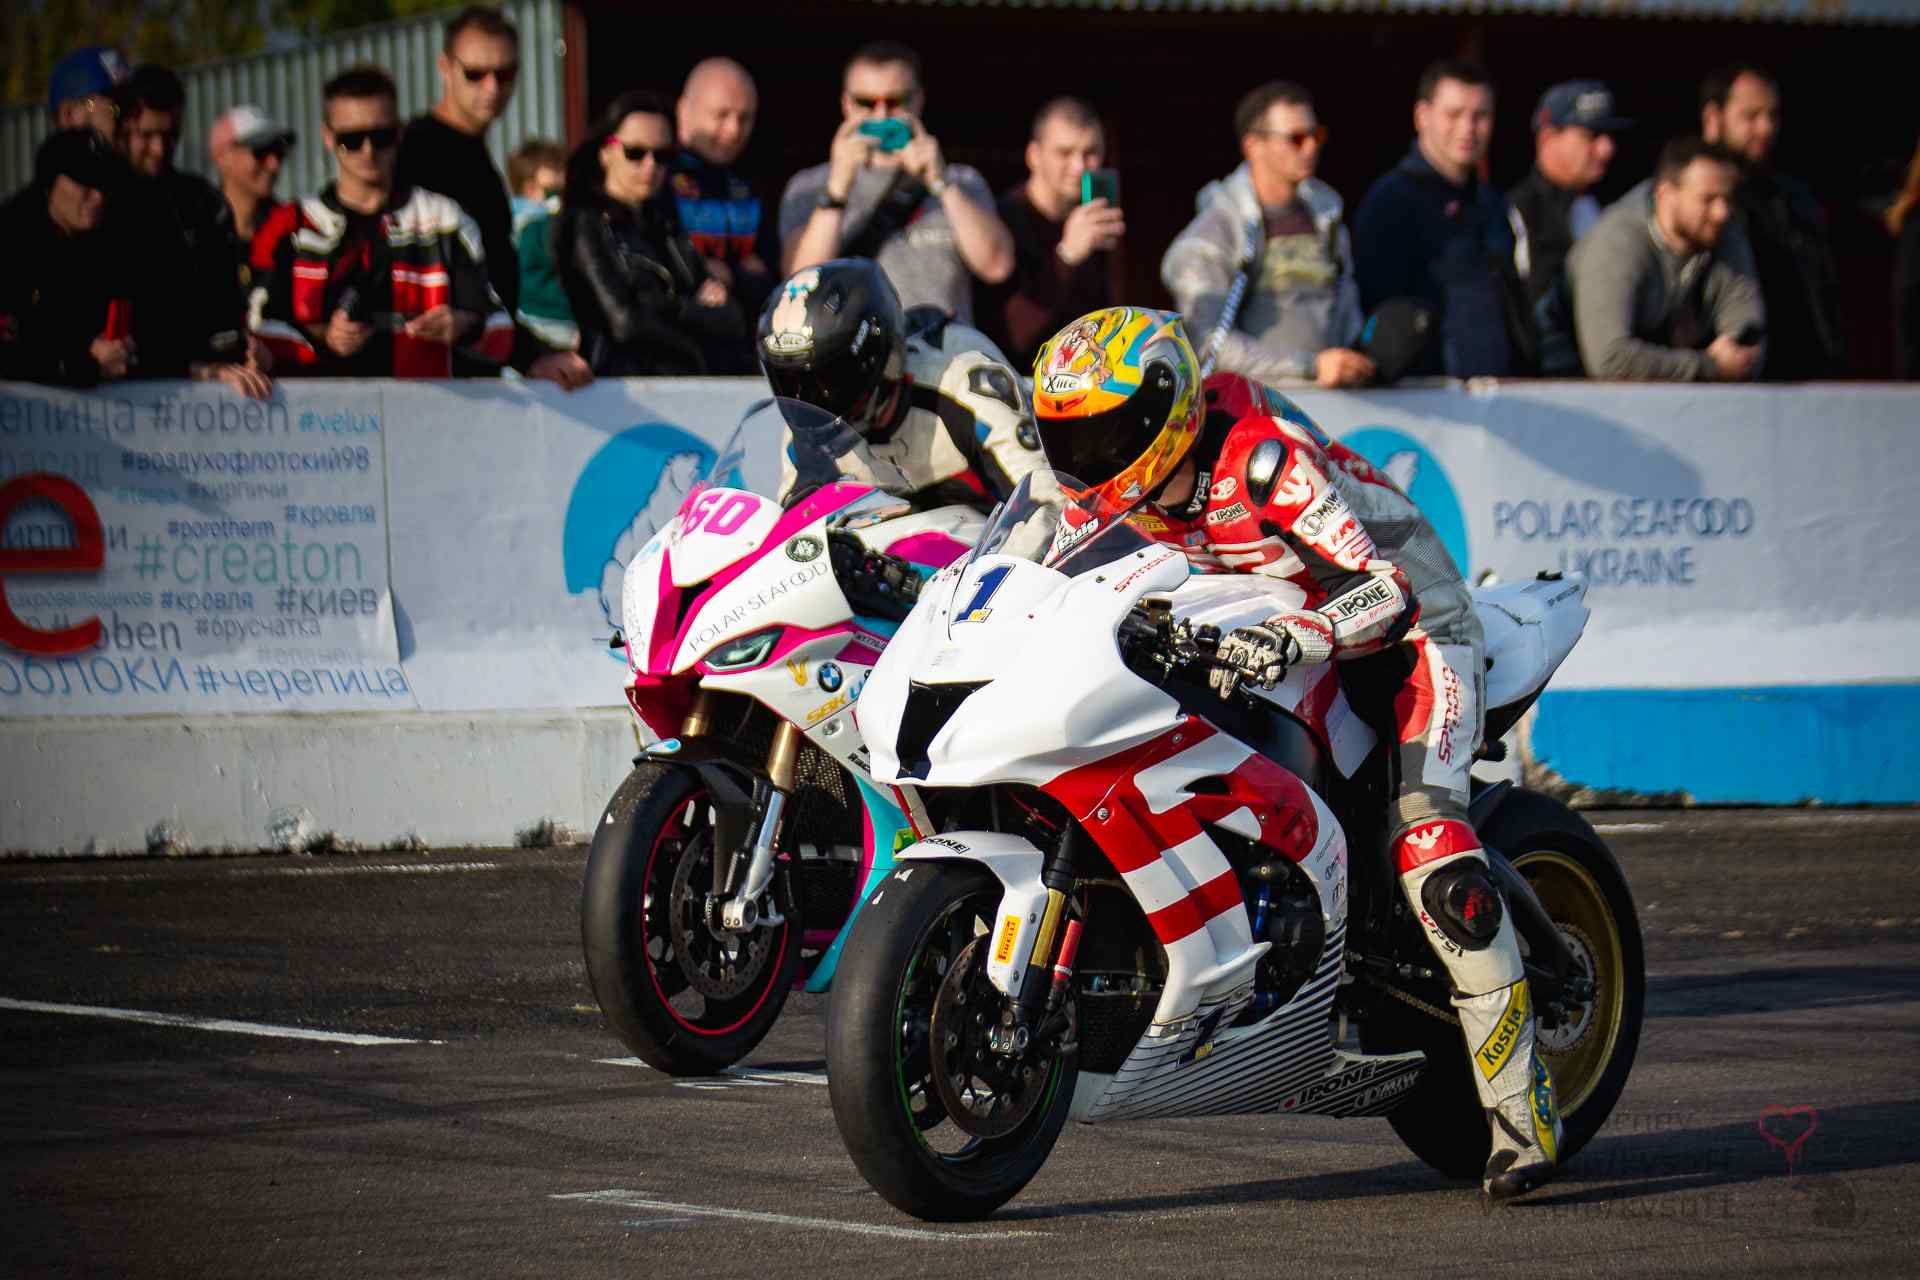 5-6_etap_MotoGPUkraine_140